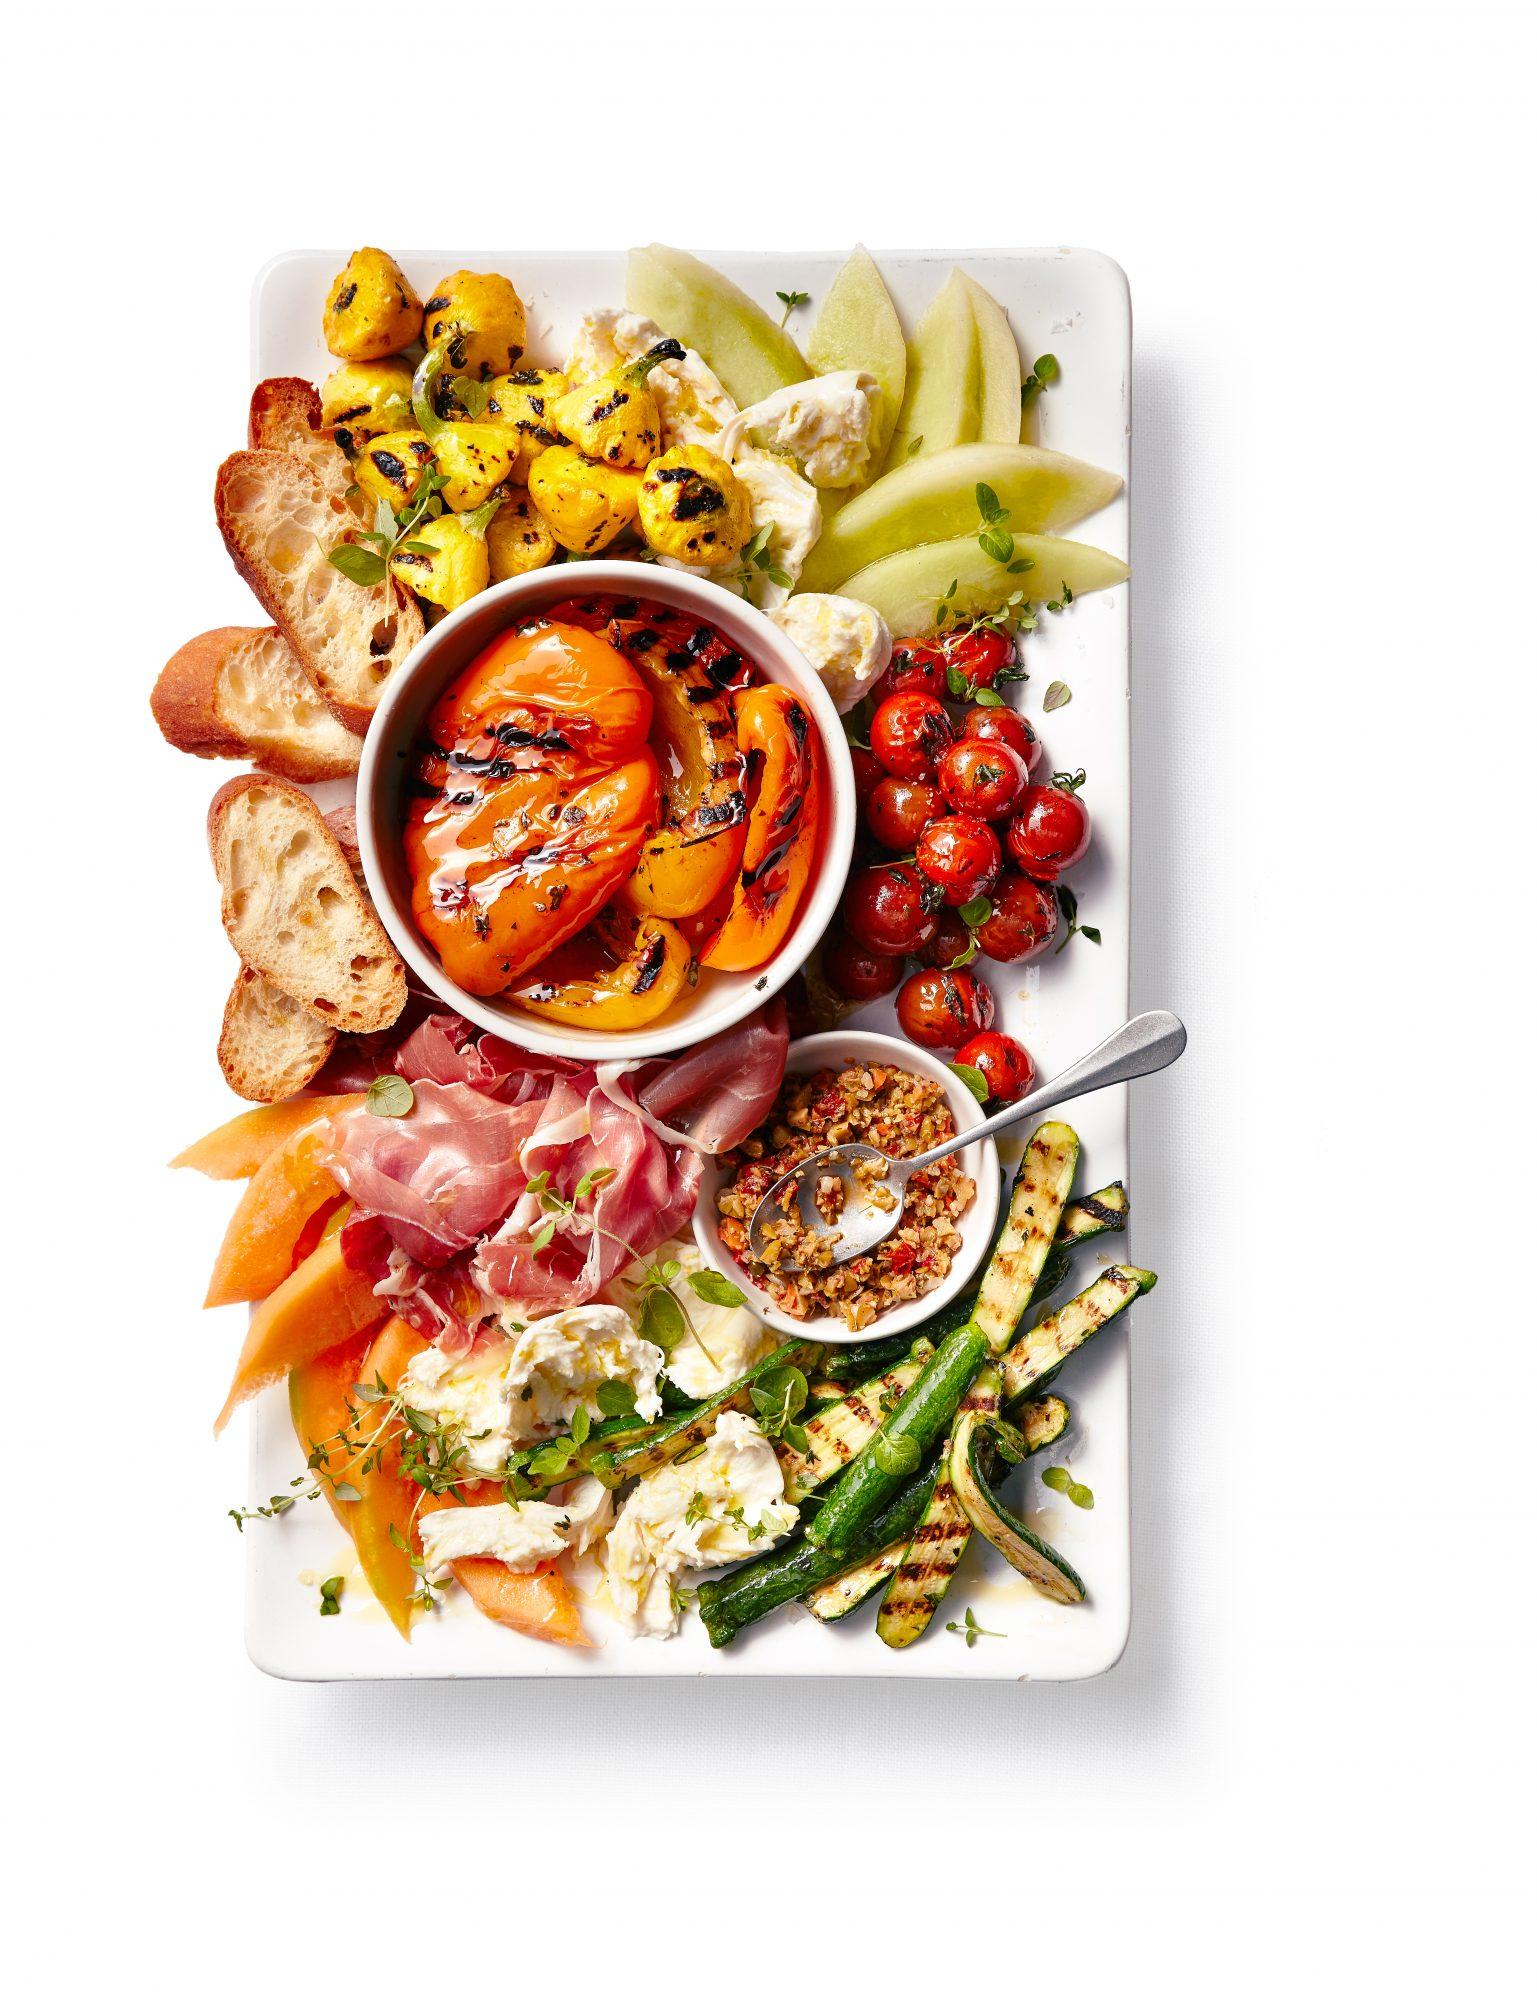 Monday Night Grilled Vegetable Platter